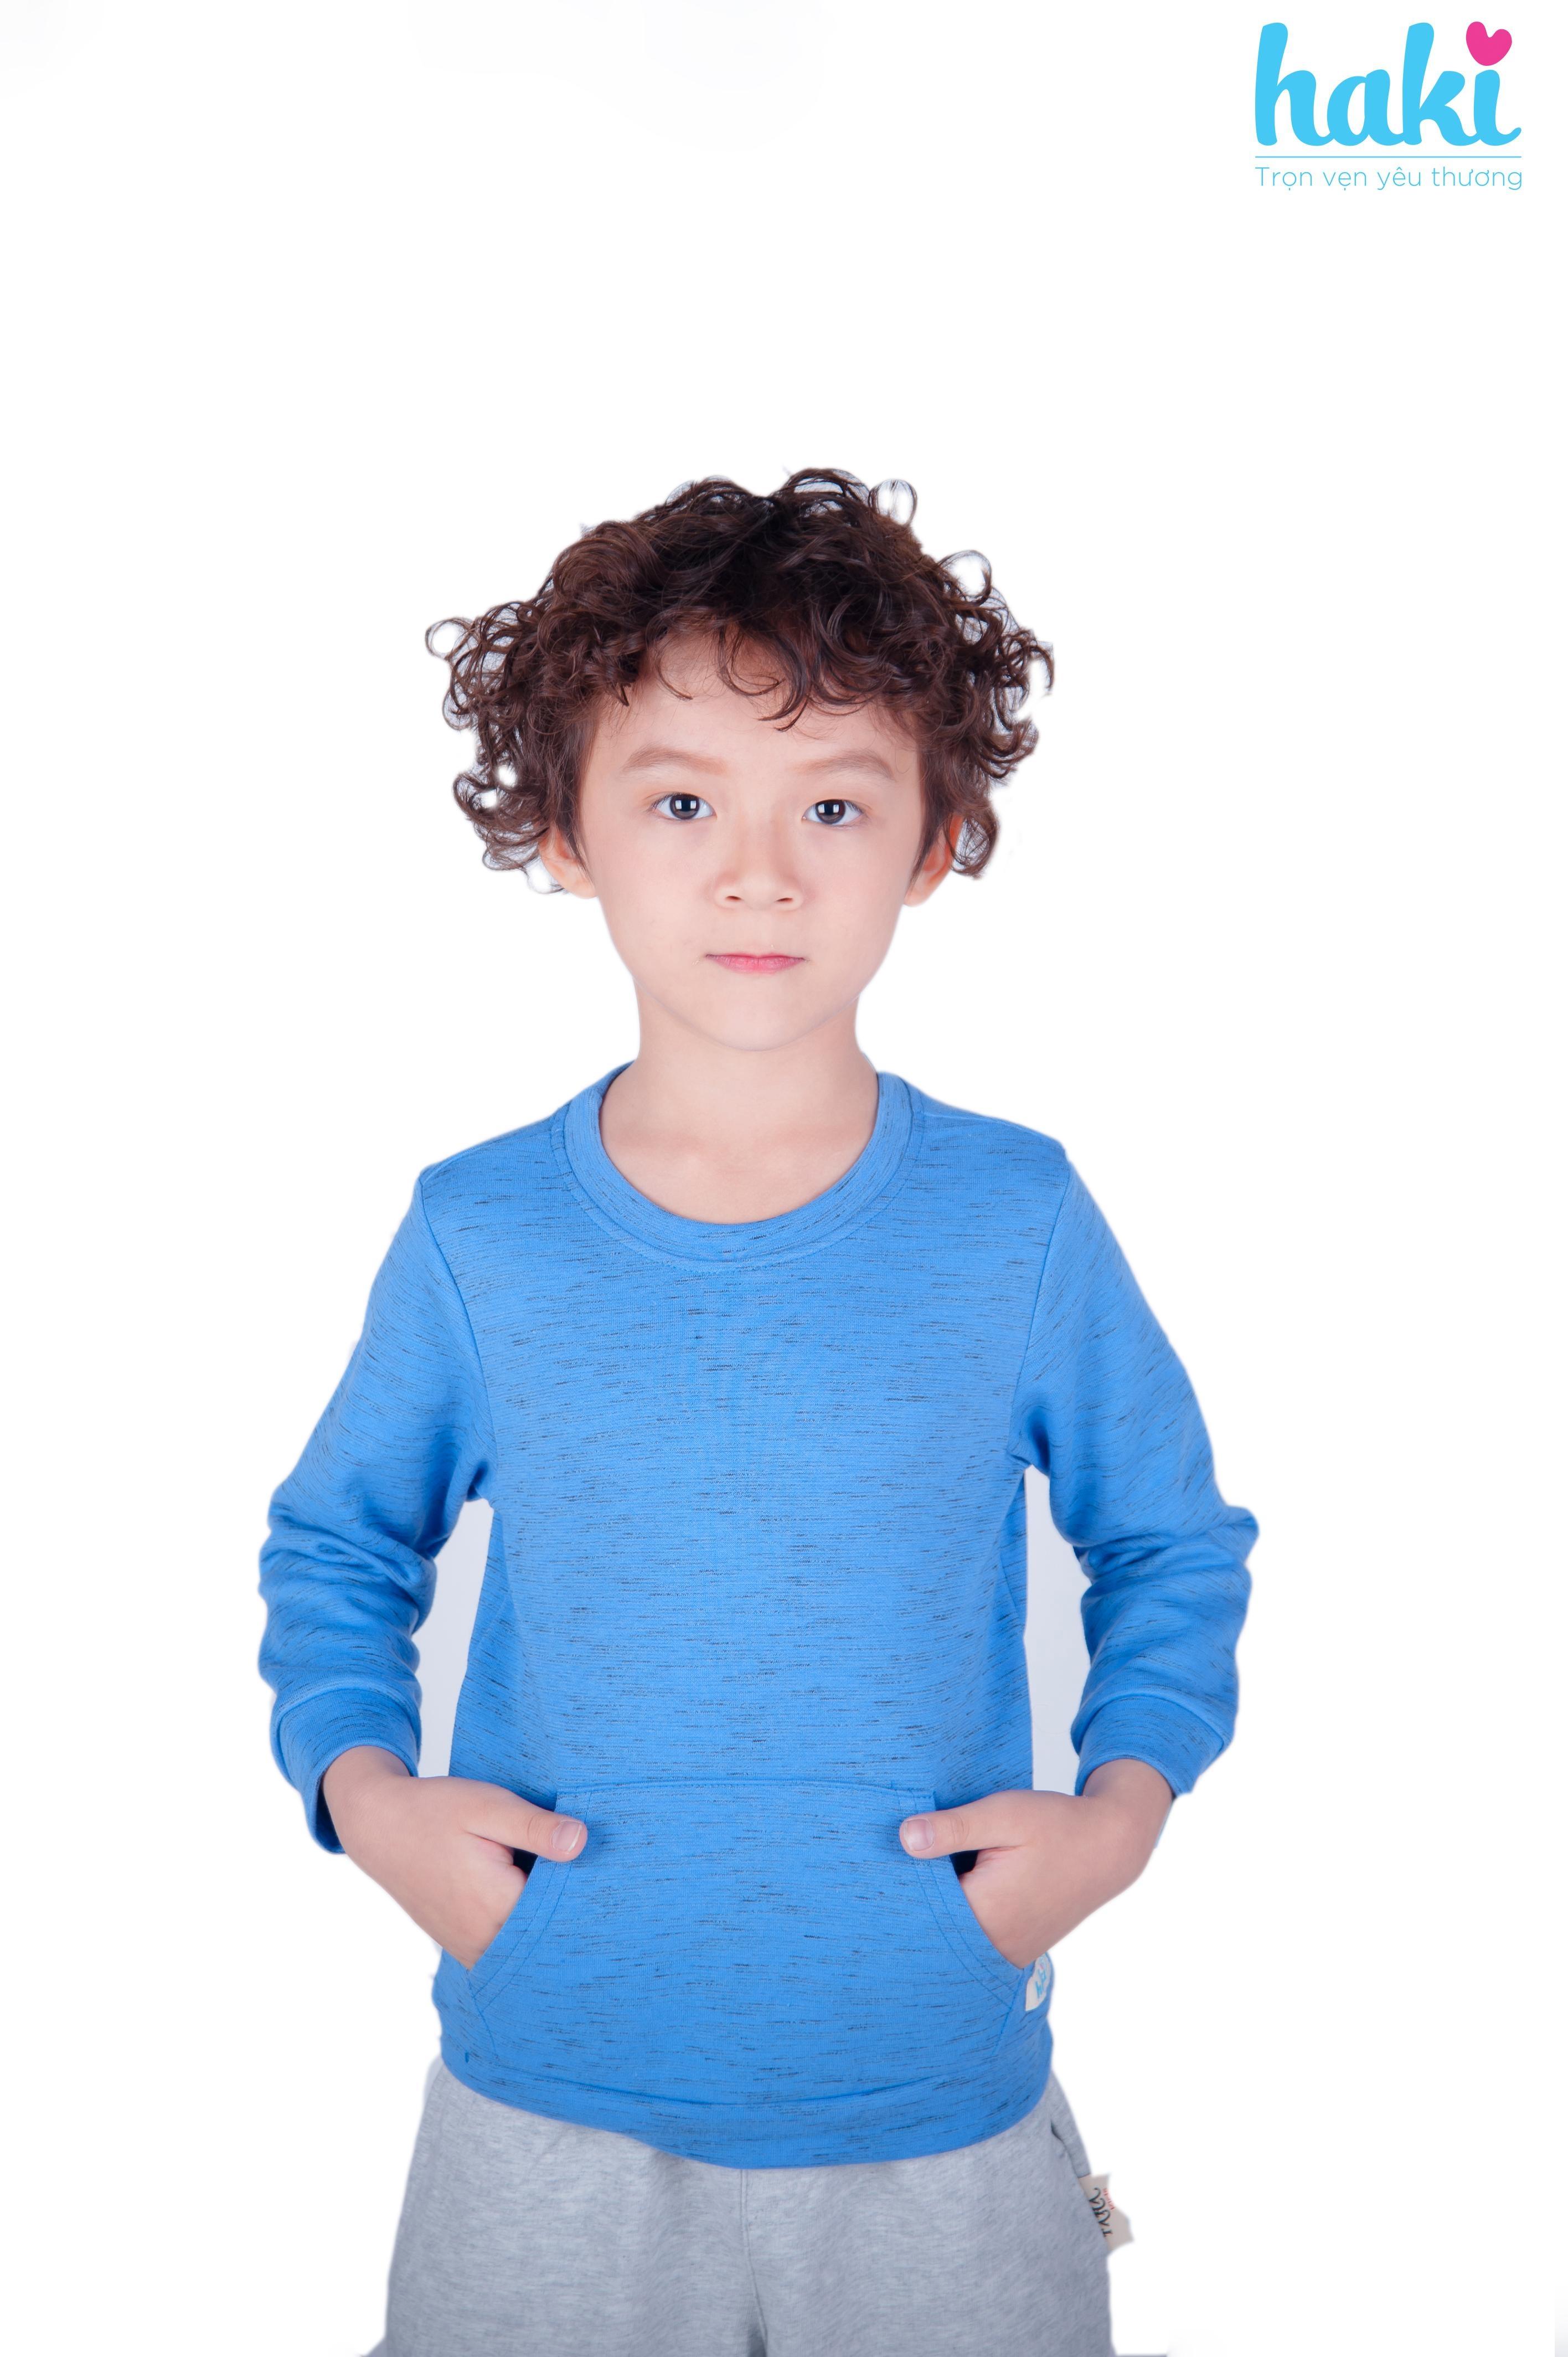 Áo nỉ bé trai cổ tròn size từ 2-3 tuổi